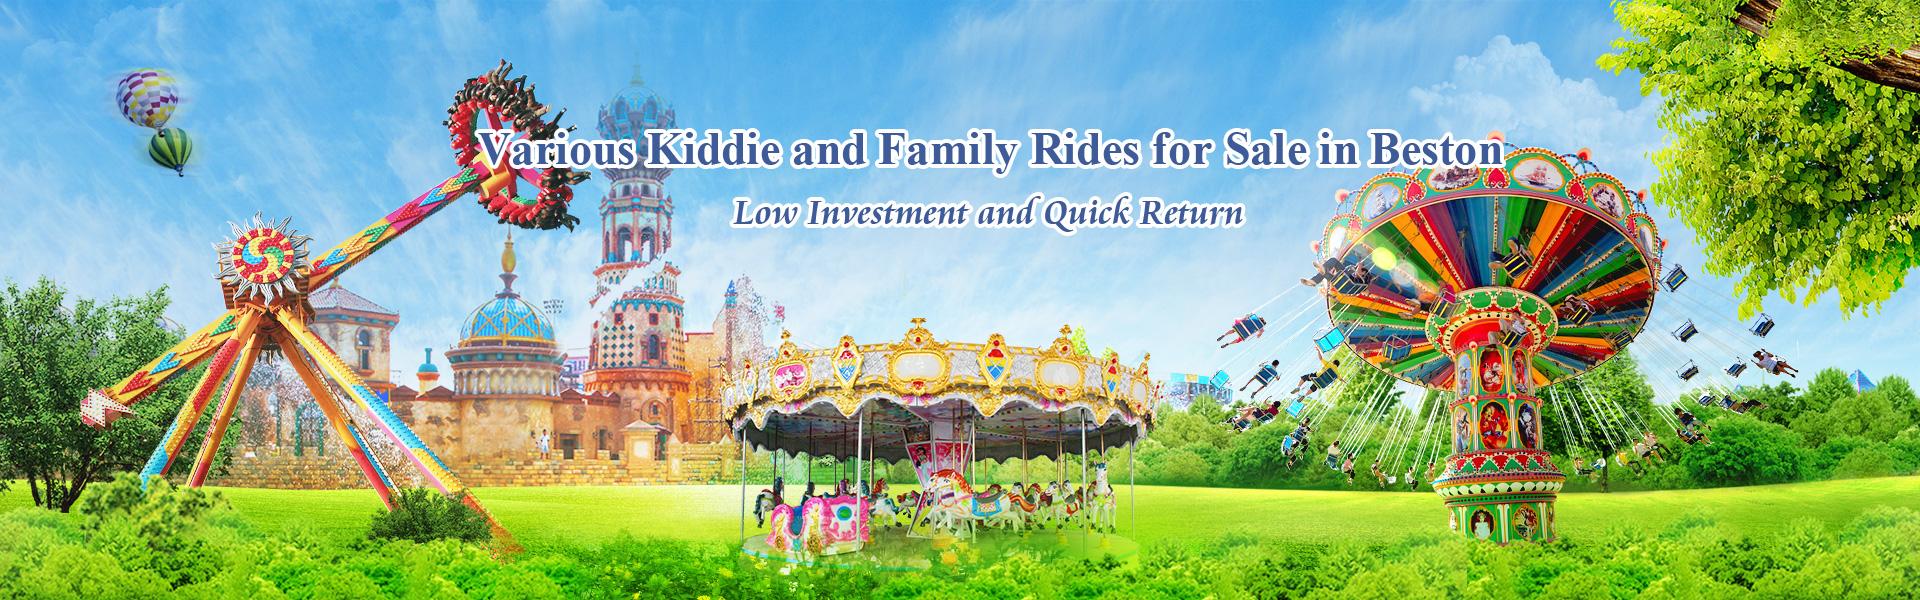 Family & Kids Rides